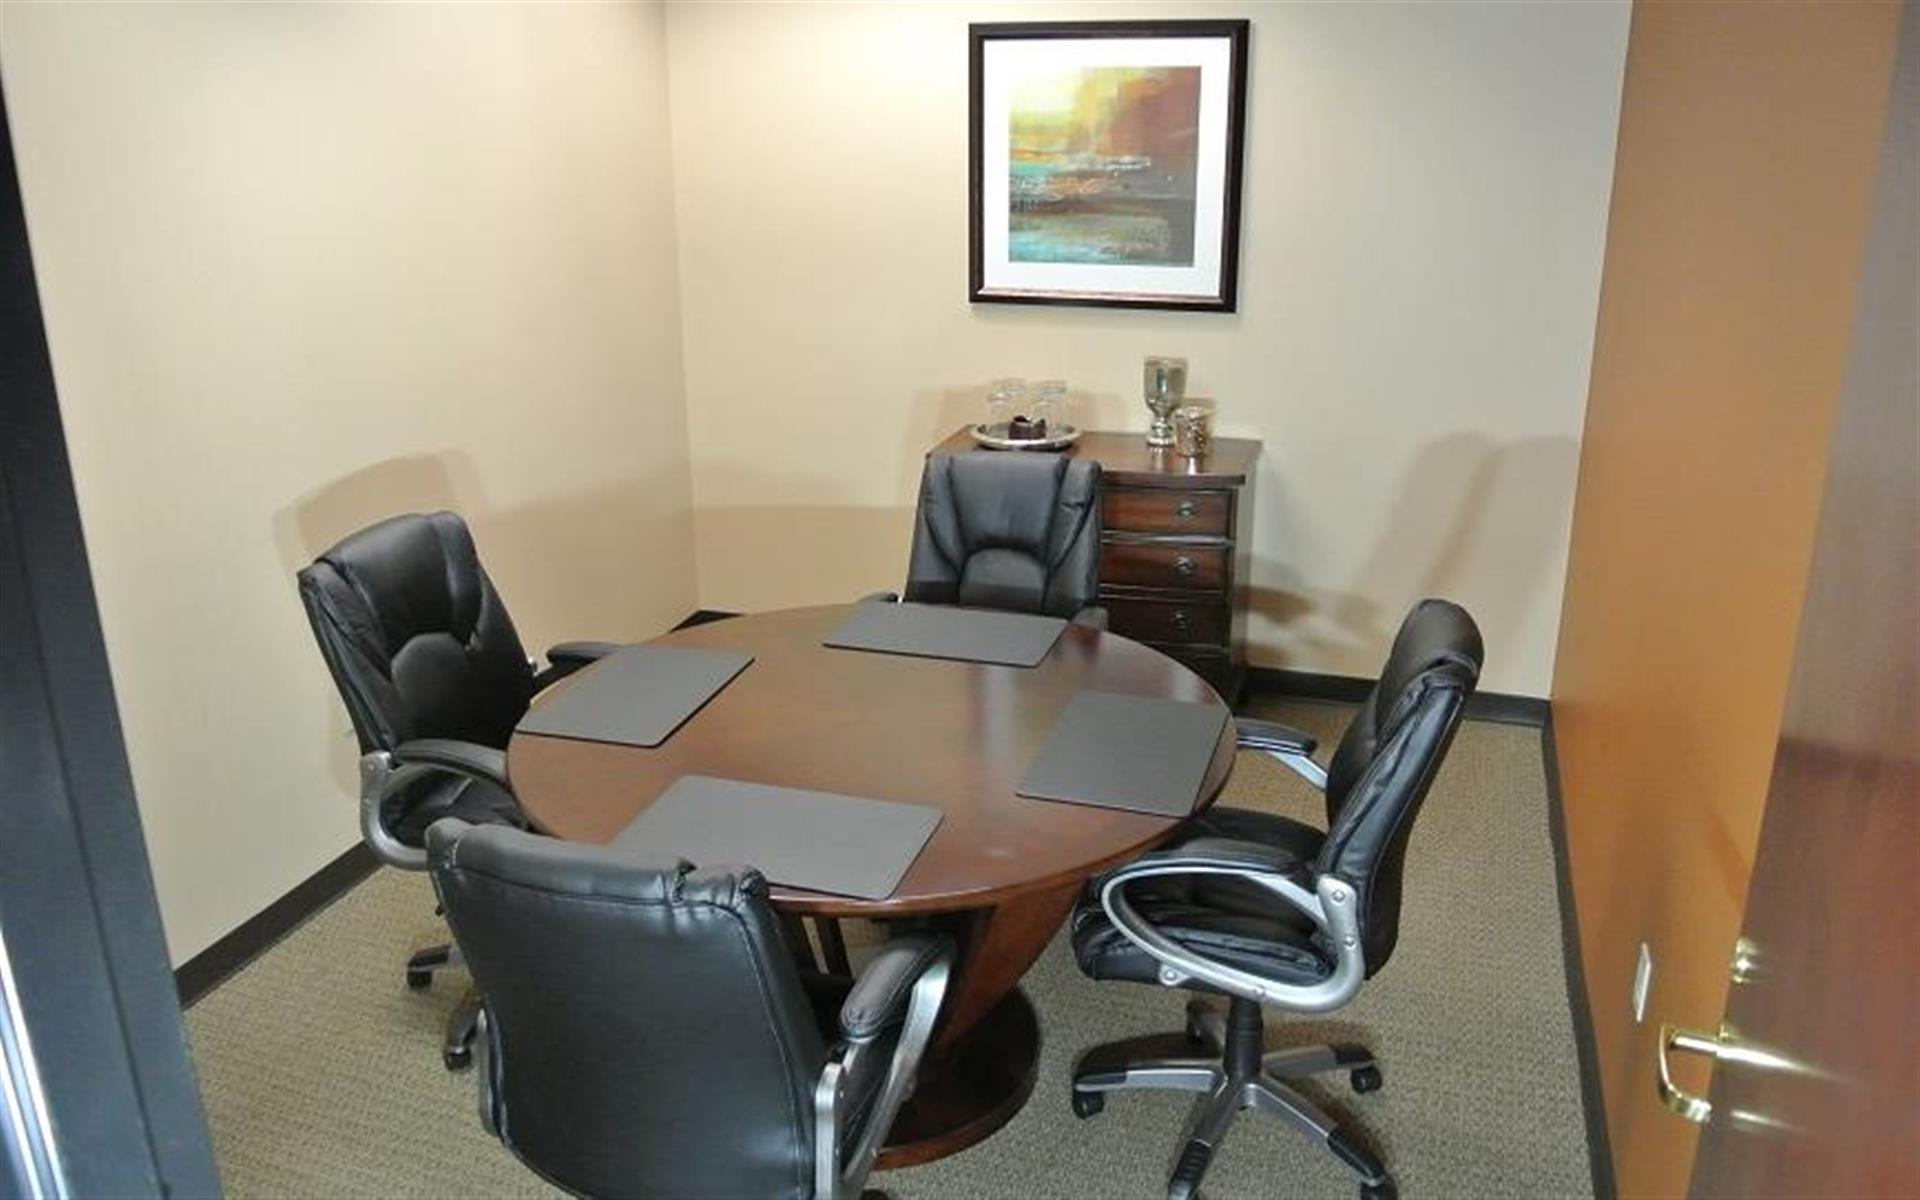 Orlando Office Center - Downtown Orlando - Meeting Room for Four